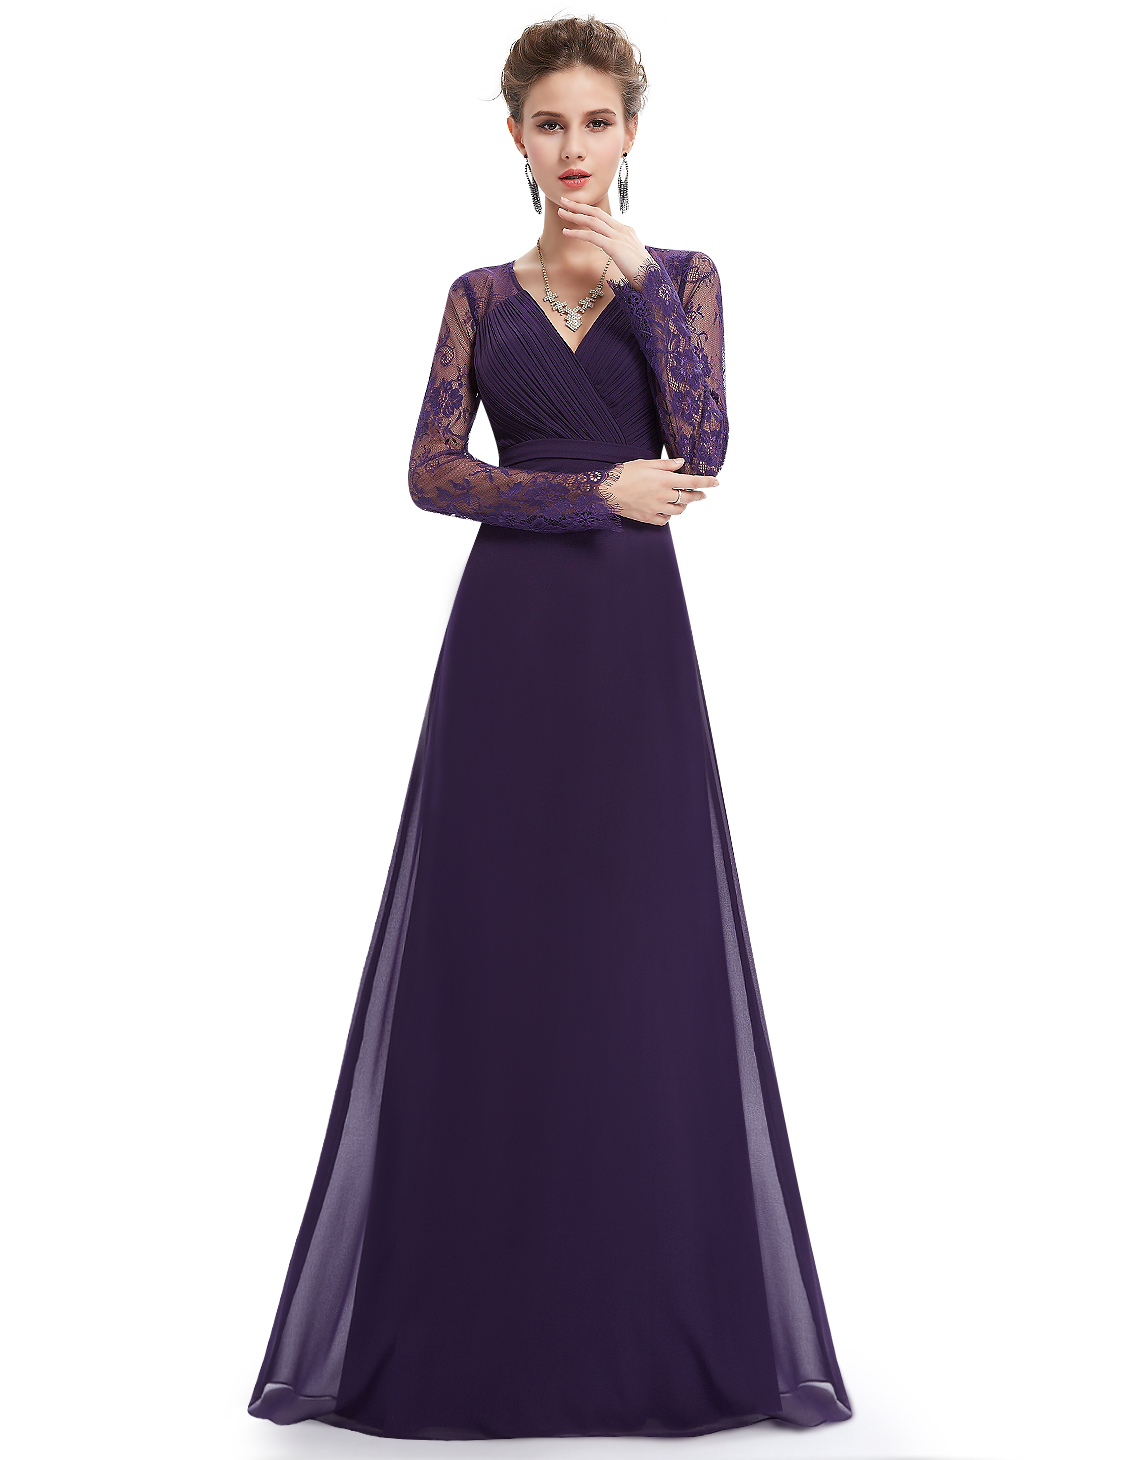 Lace Purple Formal Dress